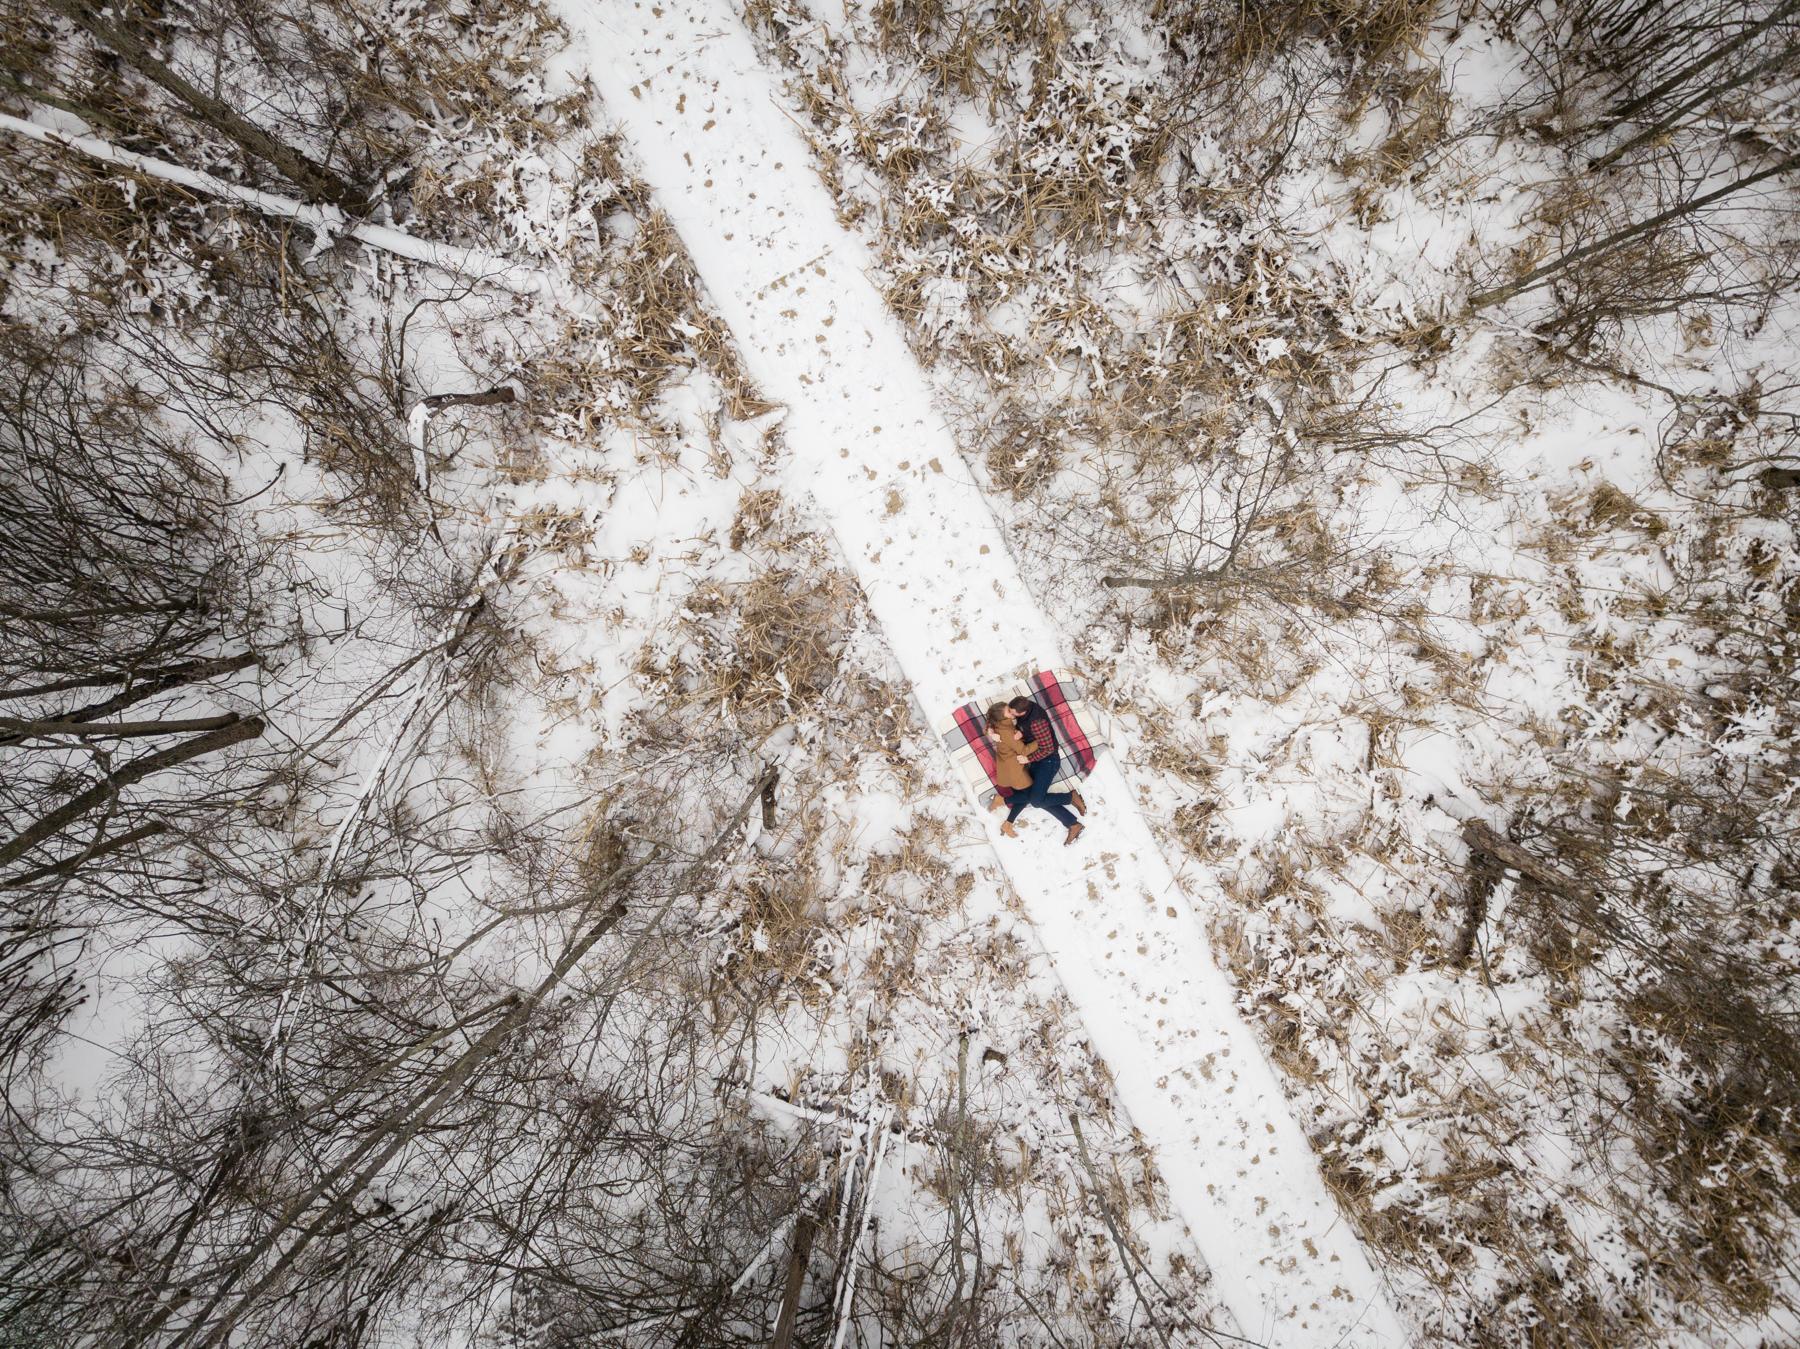 Doug&Kara_winter_Engagment_Photos_Brandon_Shafer_Photography_Blog-18.jpg